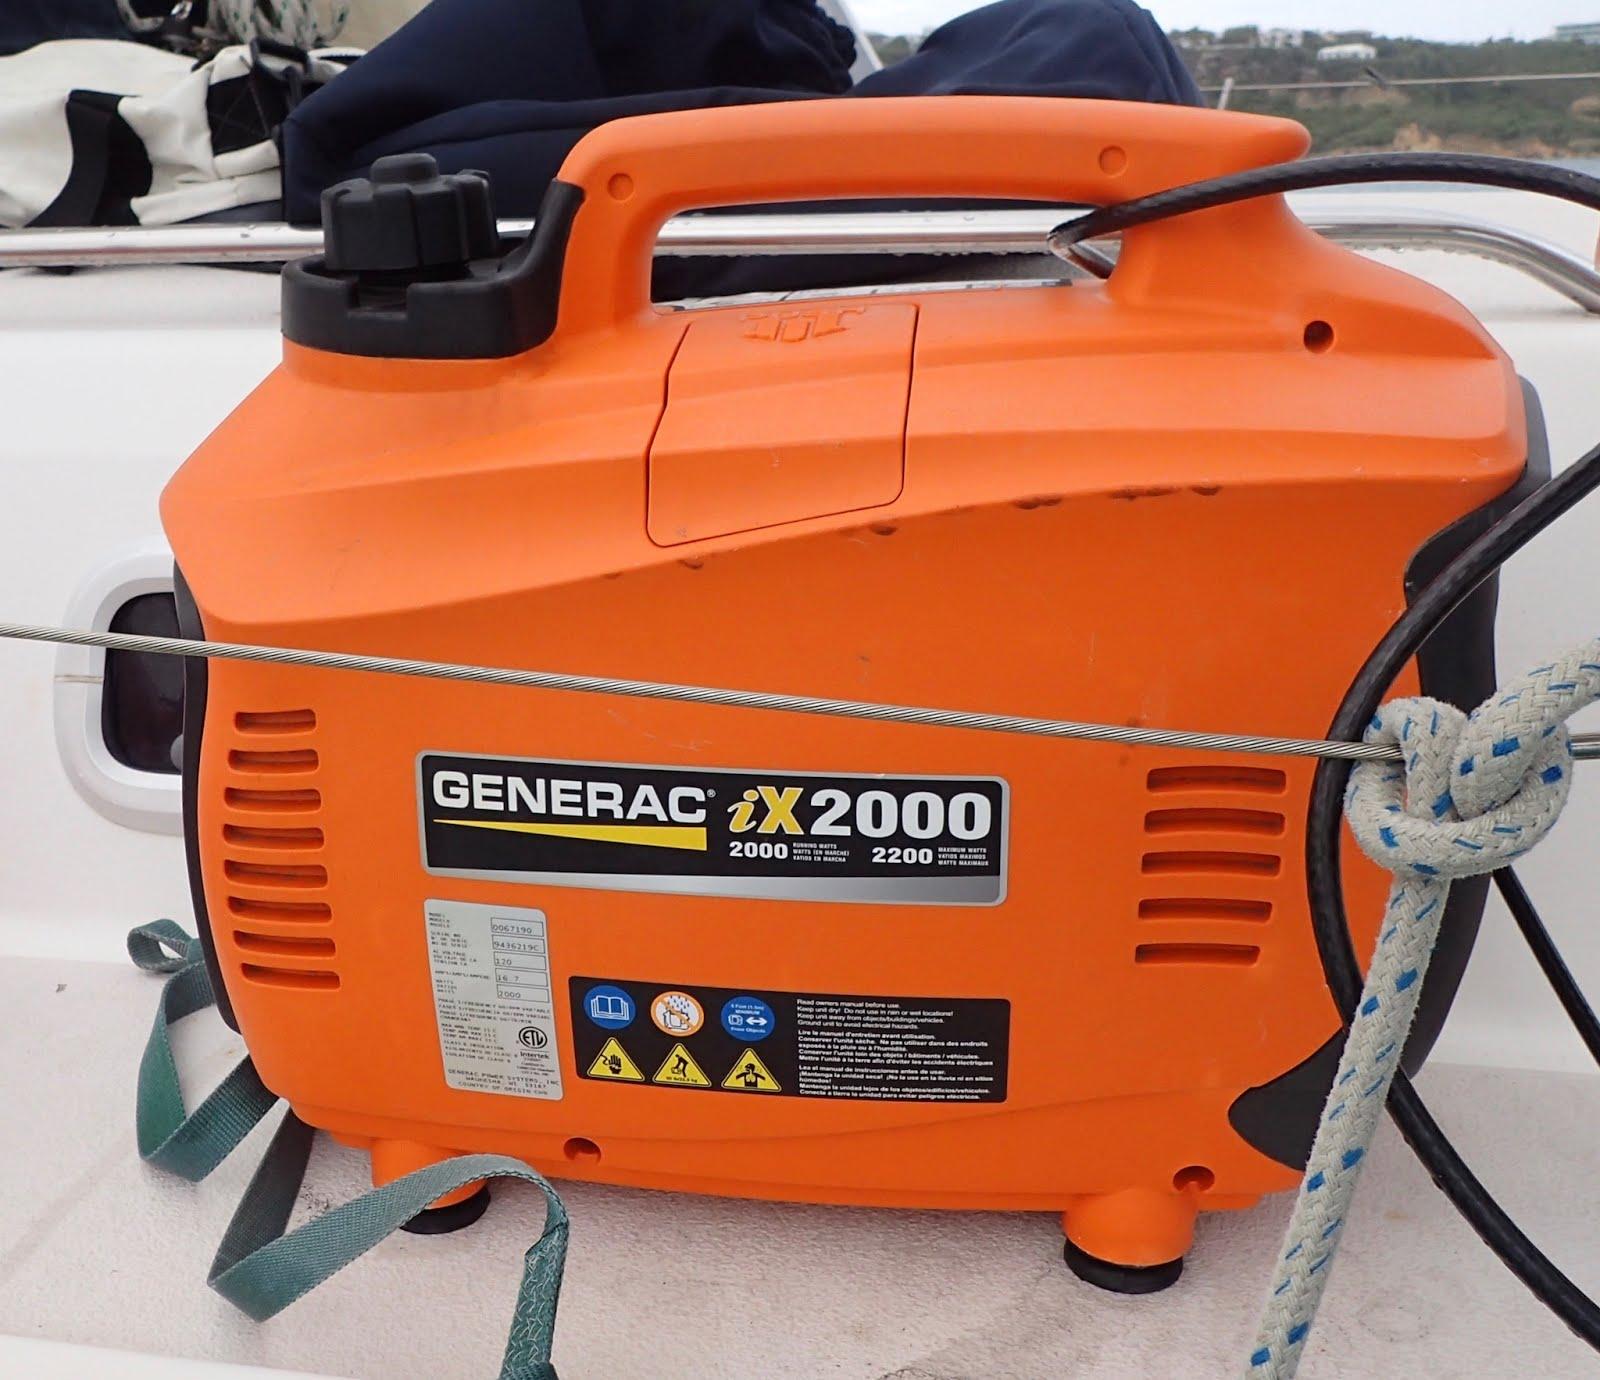 Generac Ix2000 Vs Honda EU2000i Which Portable Unit Is More Reliable